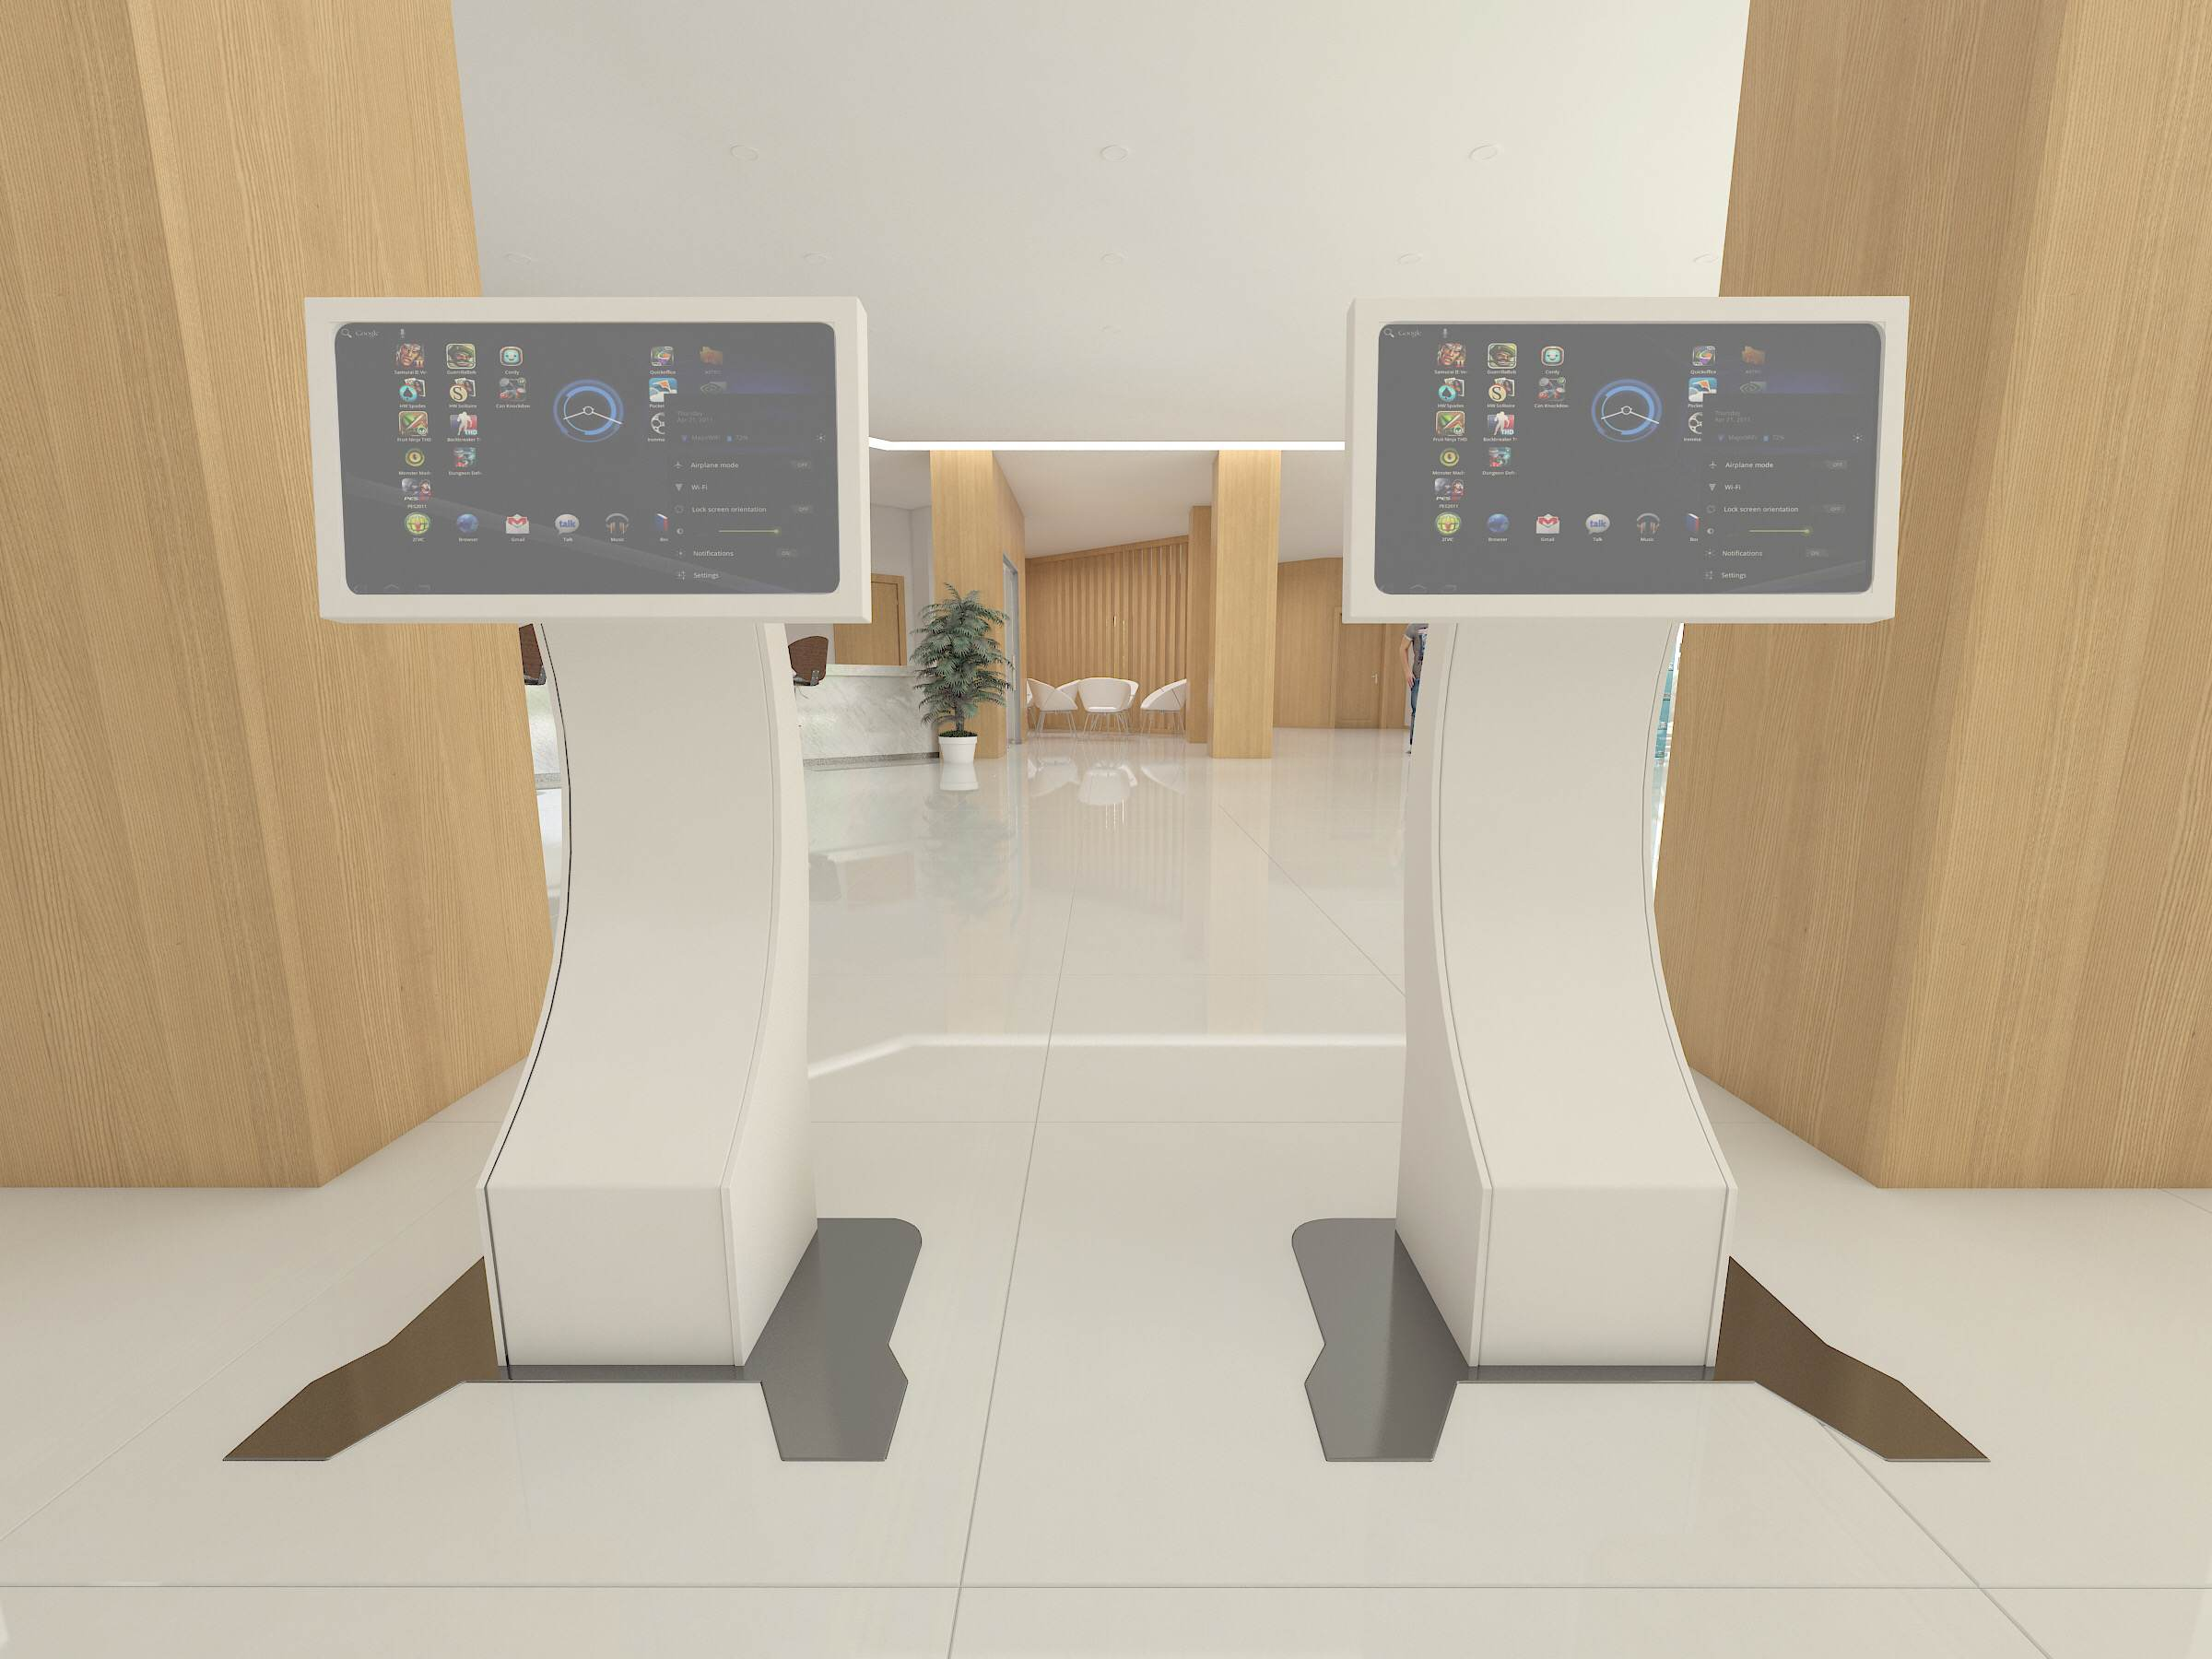 Stand-alone interactive media